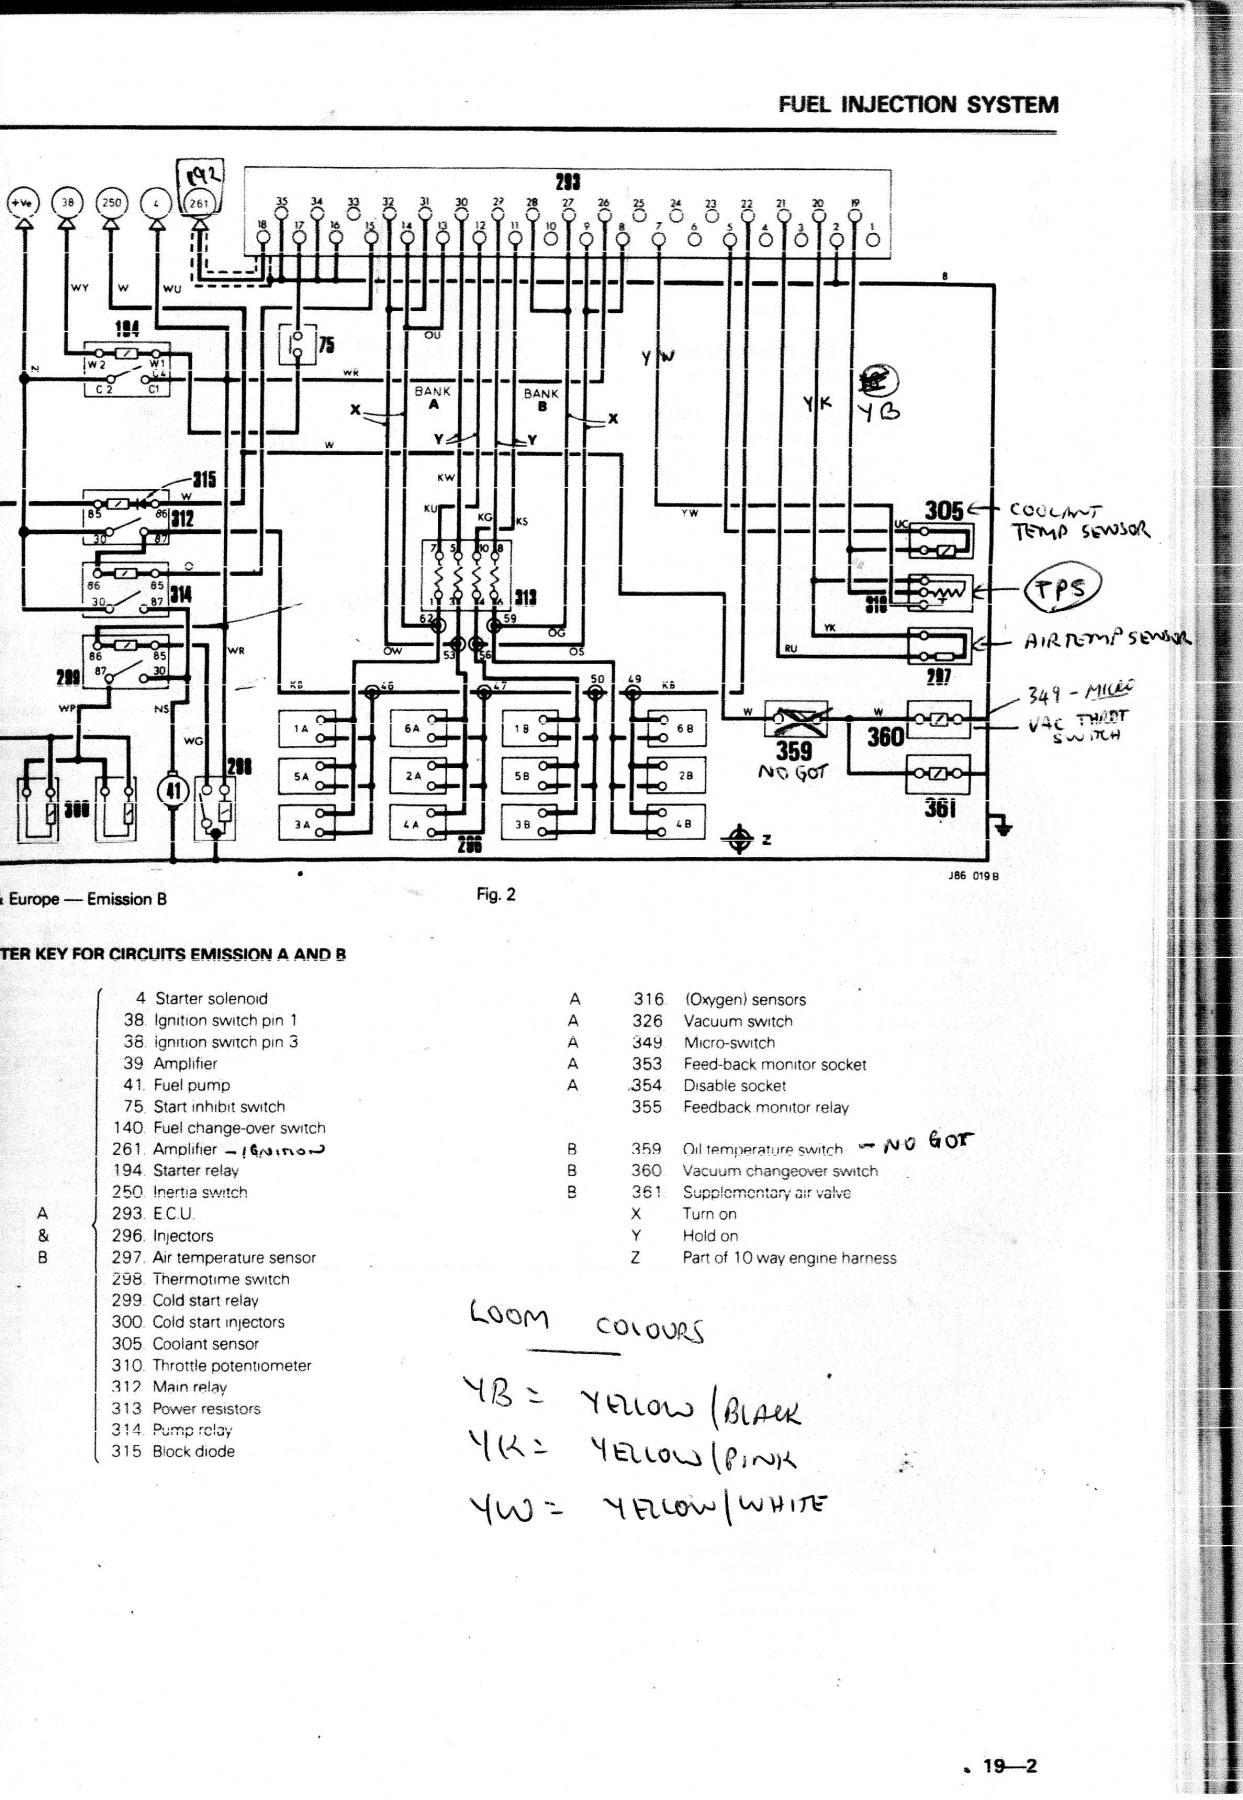 diagram] jaguar xj6 series 1 wiring diagram full version hd quality wiring  diagram - ardiagram.rocknroad.it  diagram database - rocknroad.it